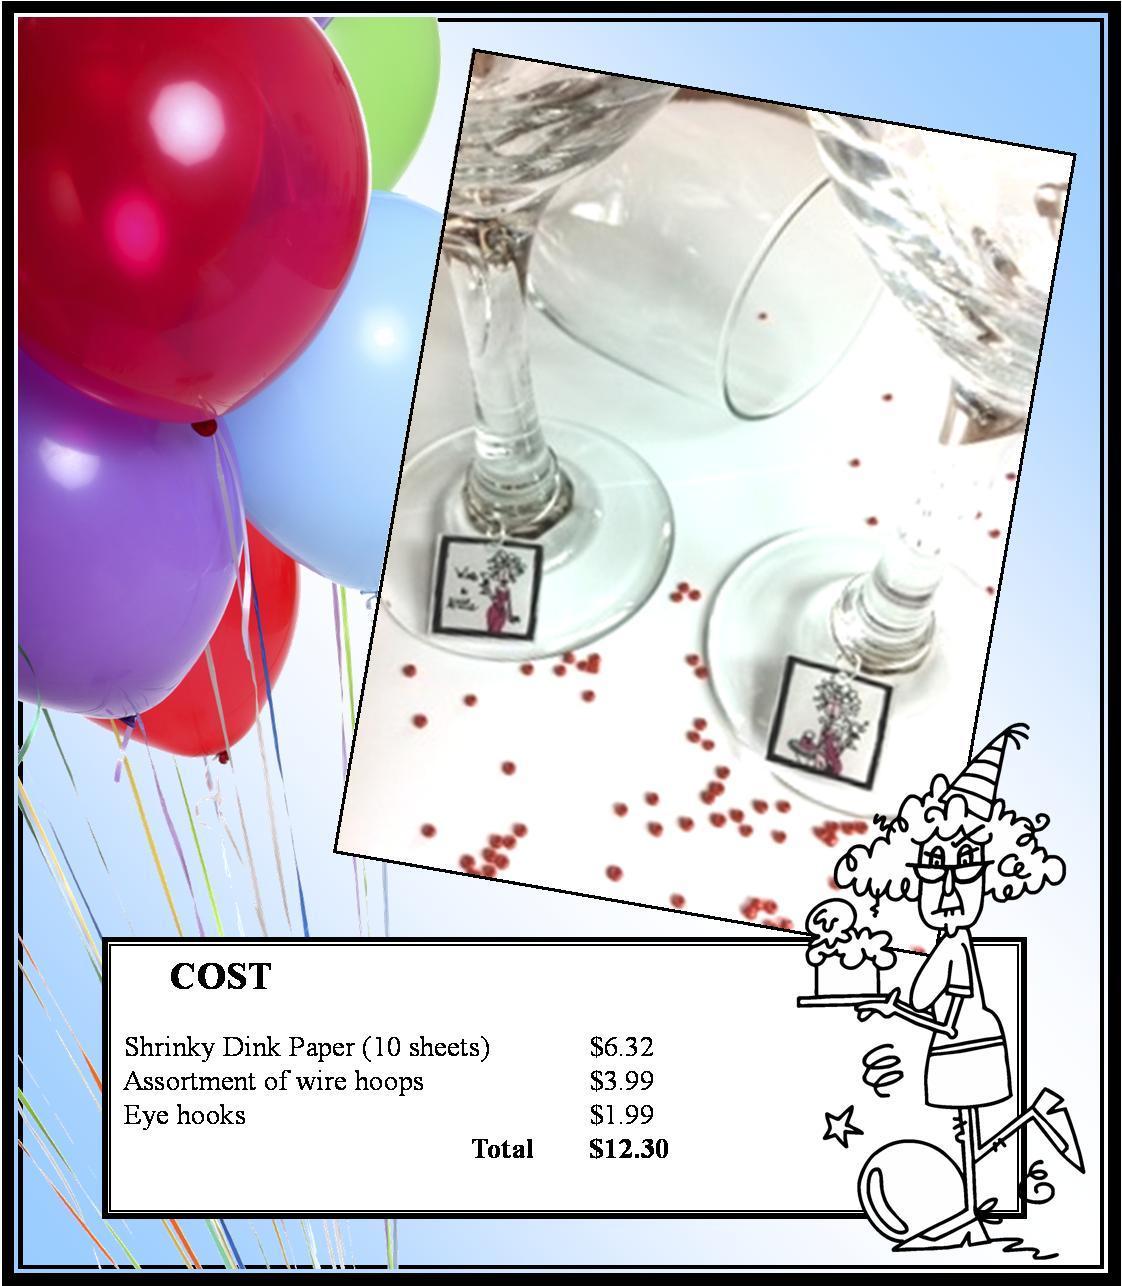 http://3.bp.blogspot.com/_G3VBb6ZN-JU/TTE5yfQmBmI/AAAAAAAAA6o/IEHyB_CYcTY/s1600/Birthday+Hop+Project+Amy.jpg